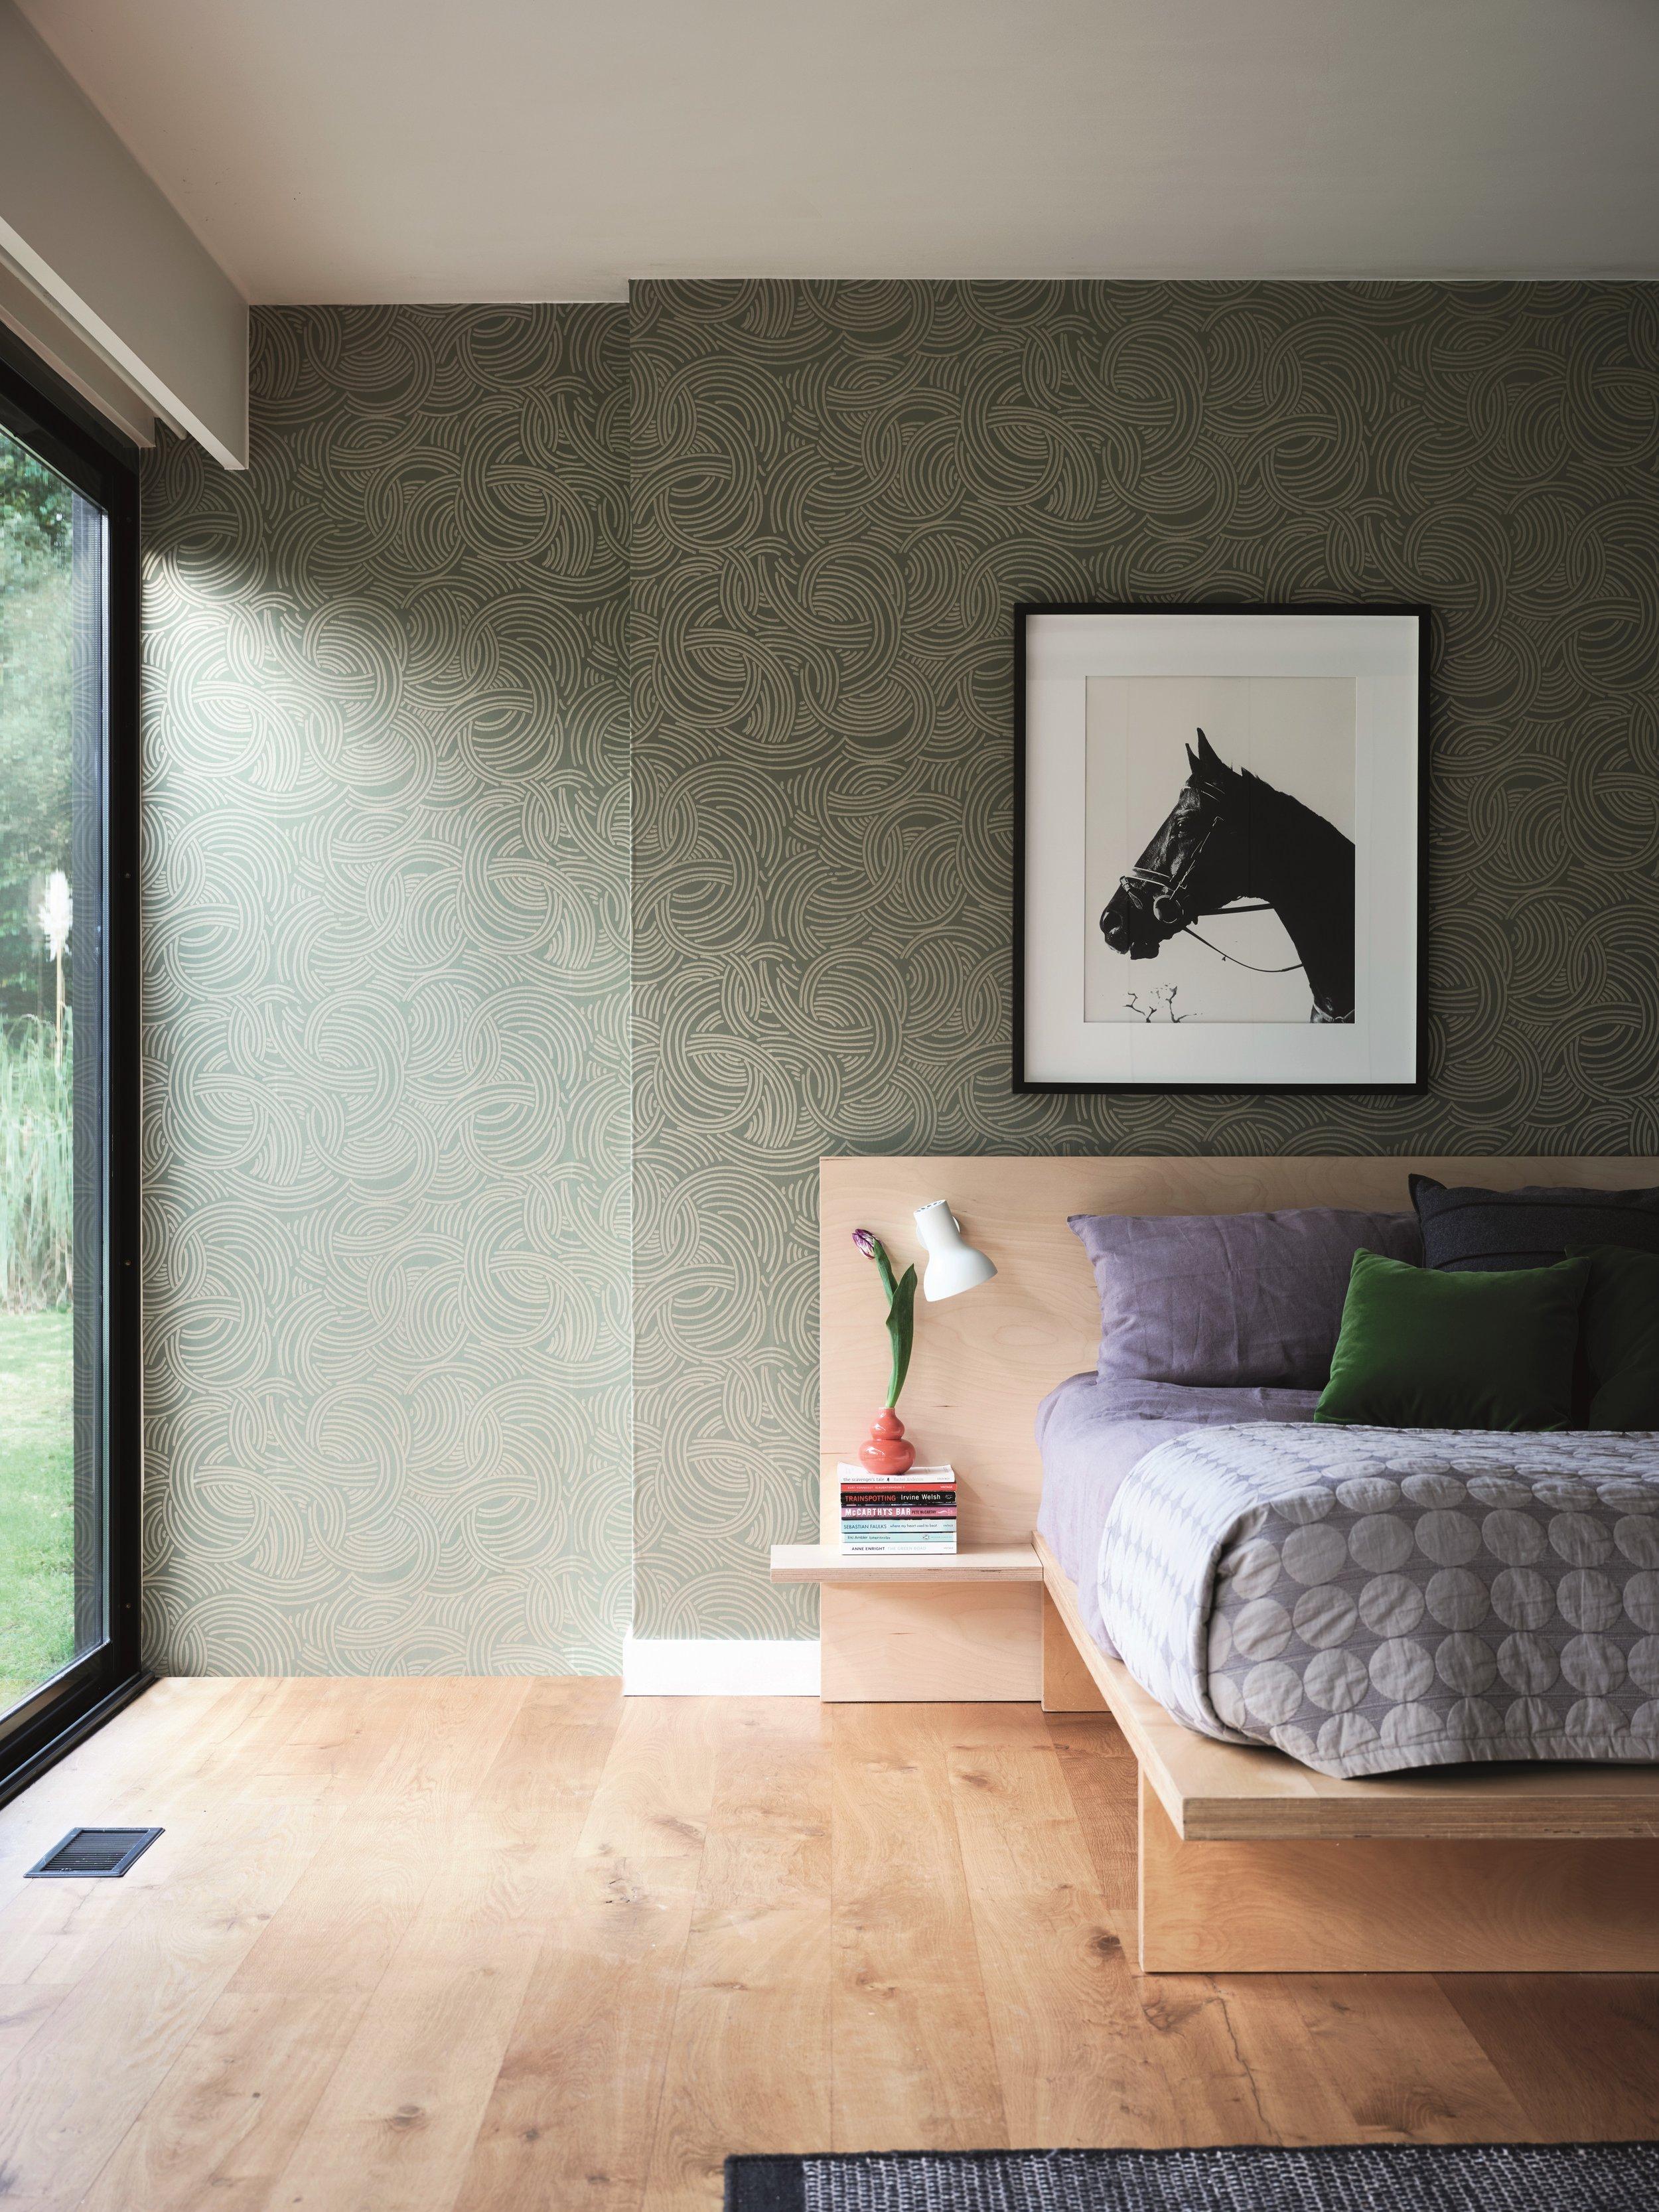 Wallpaper Shown : Tourbillon 4808